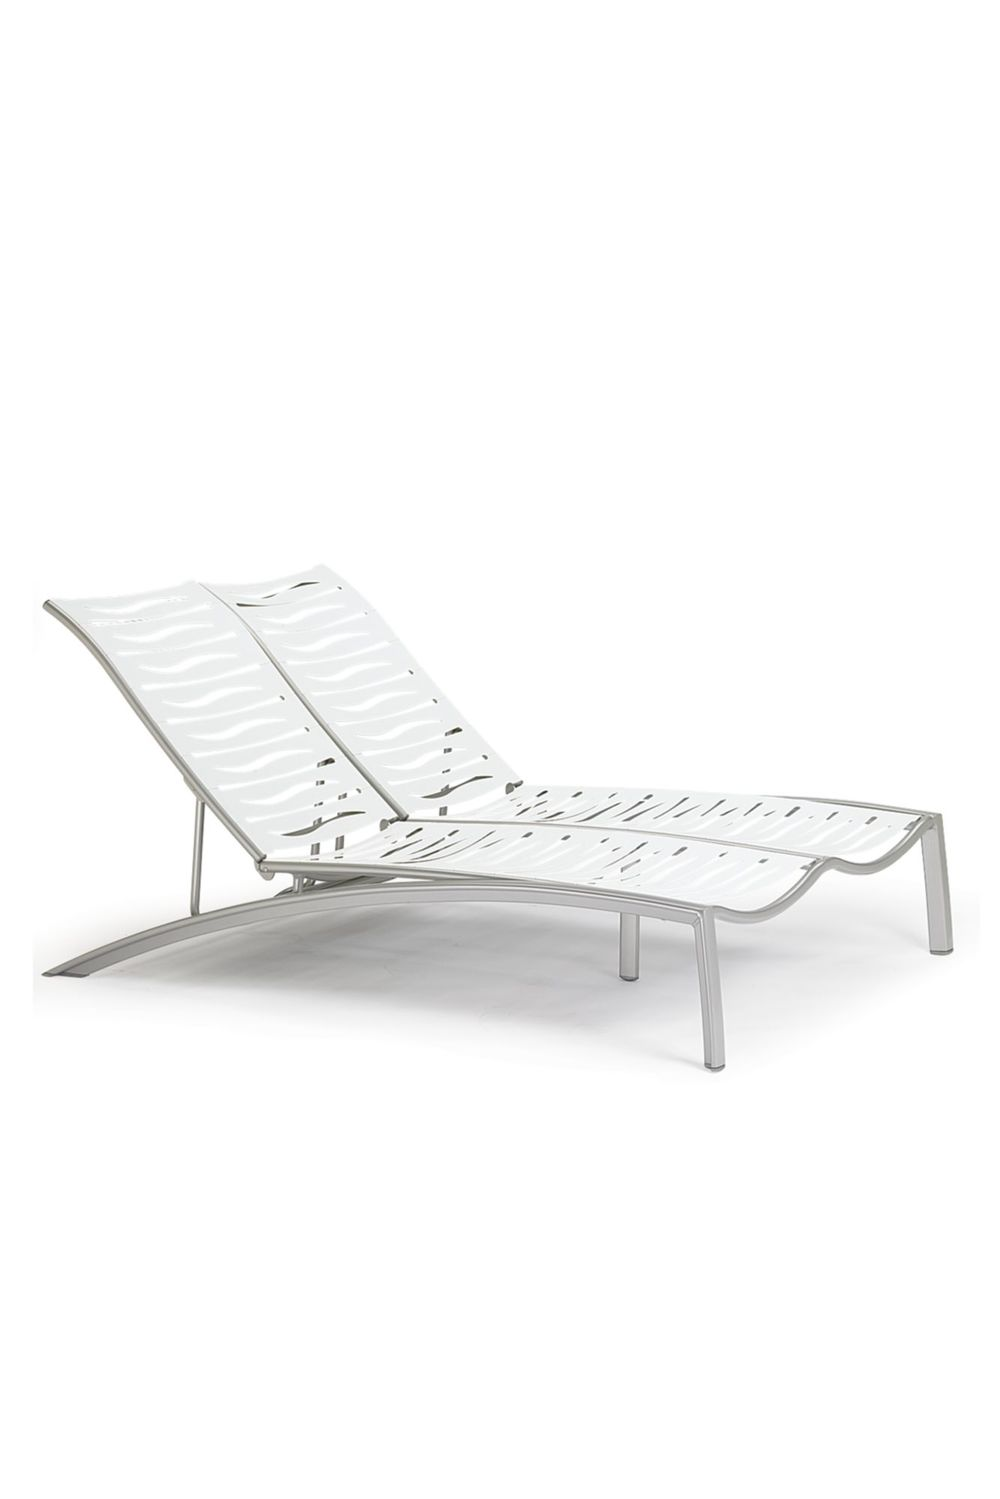 Tropitone Furniture - Double Chaise